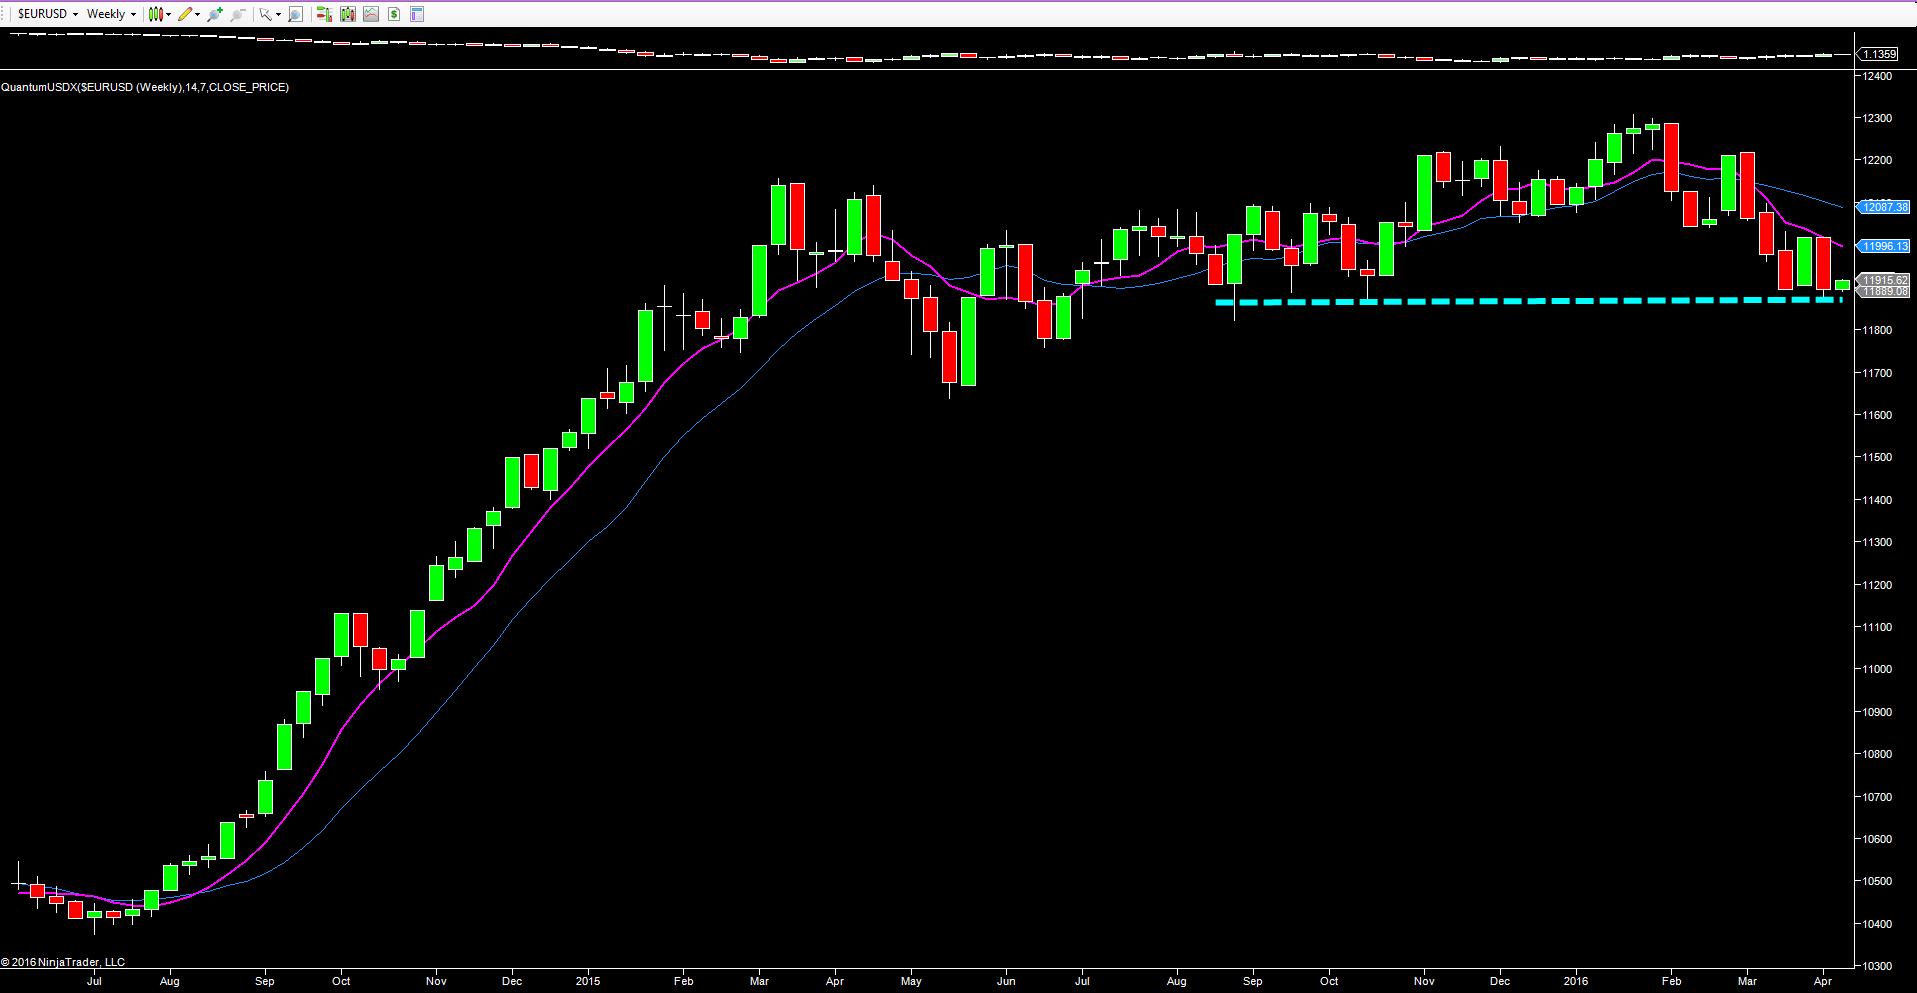 USDX_weekly_chart_quantum_trading